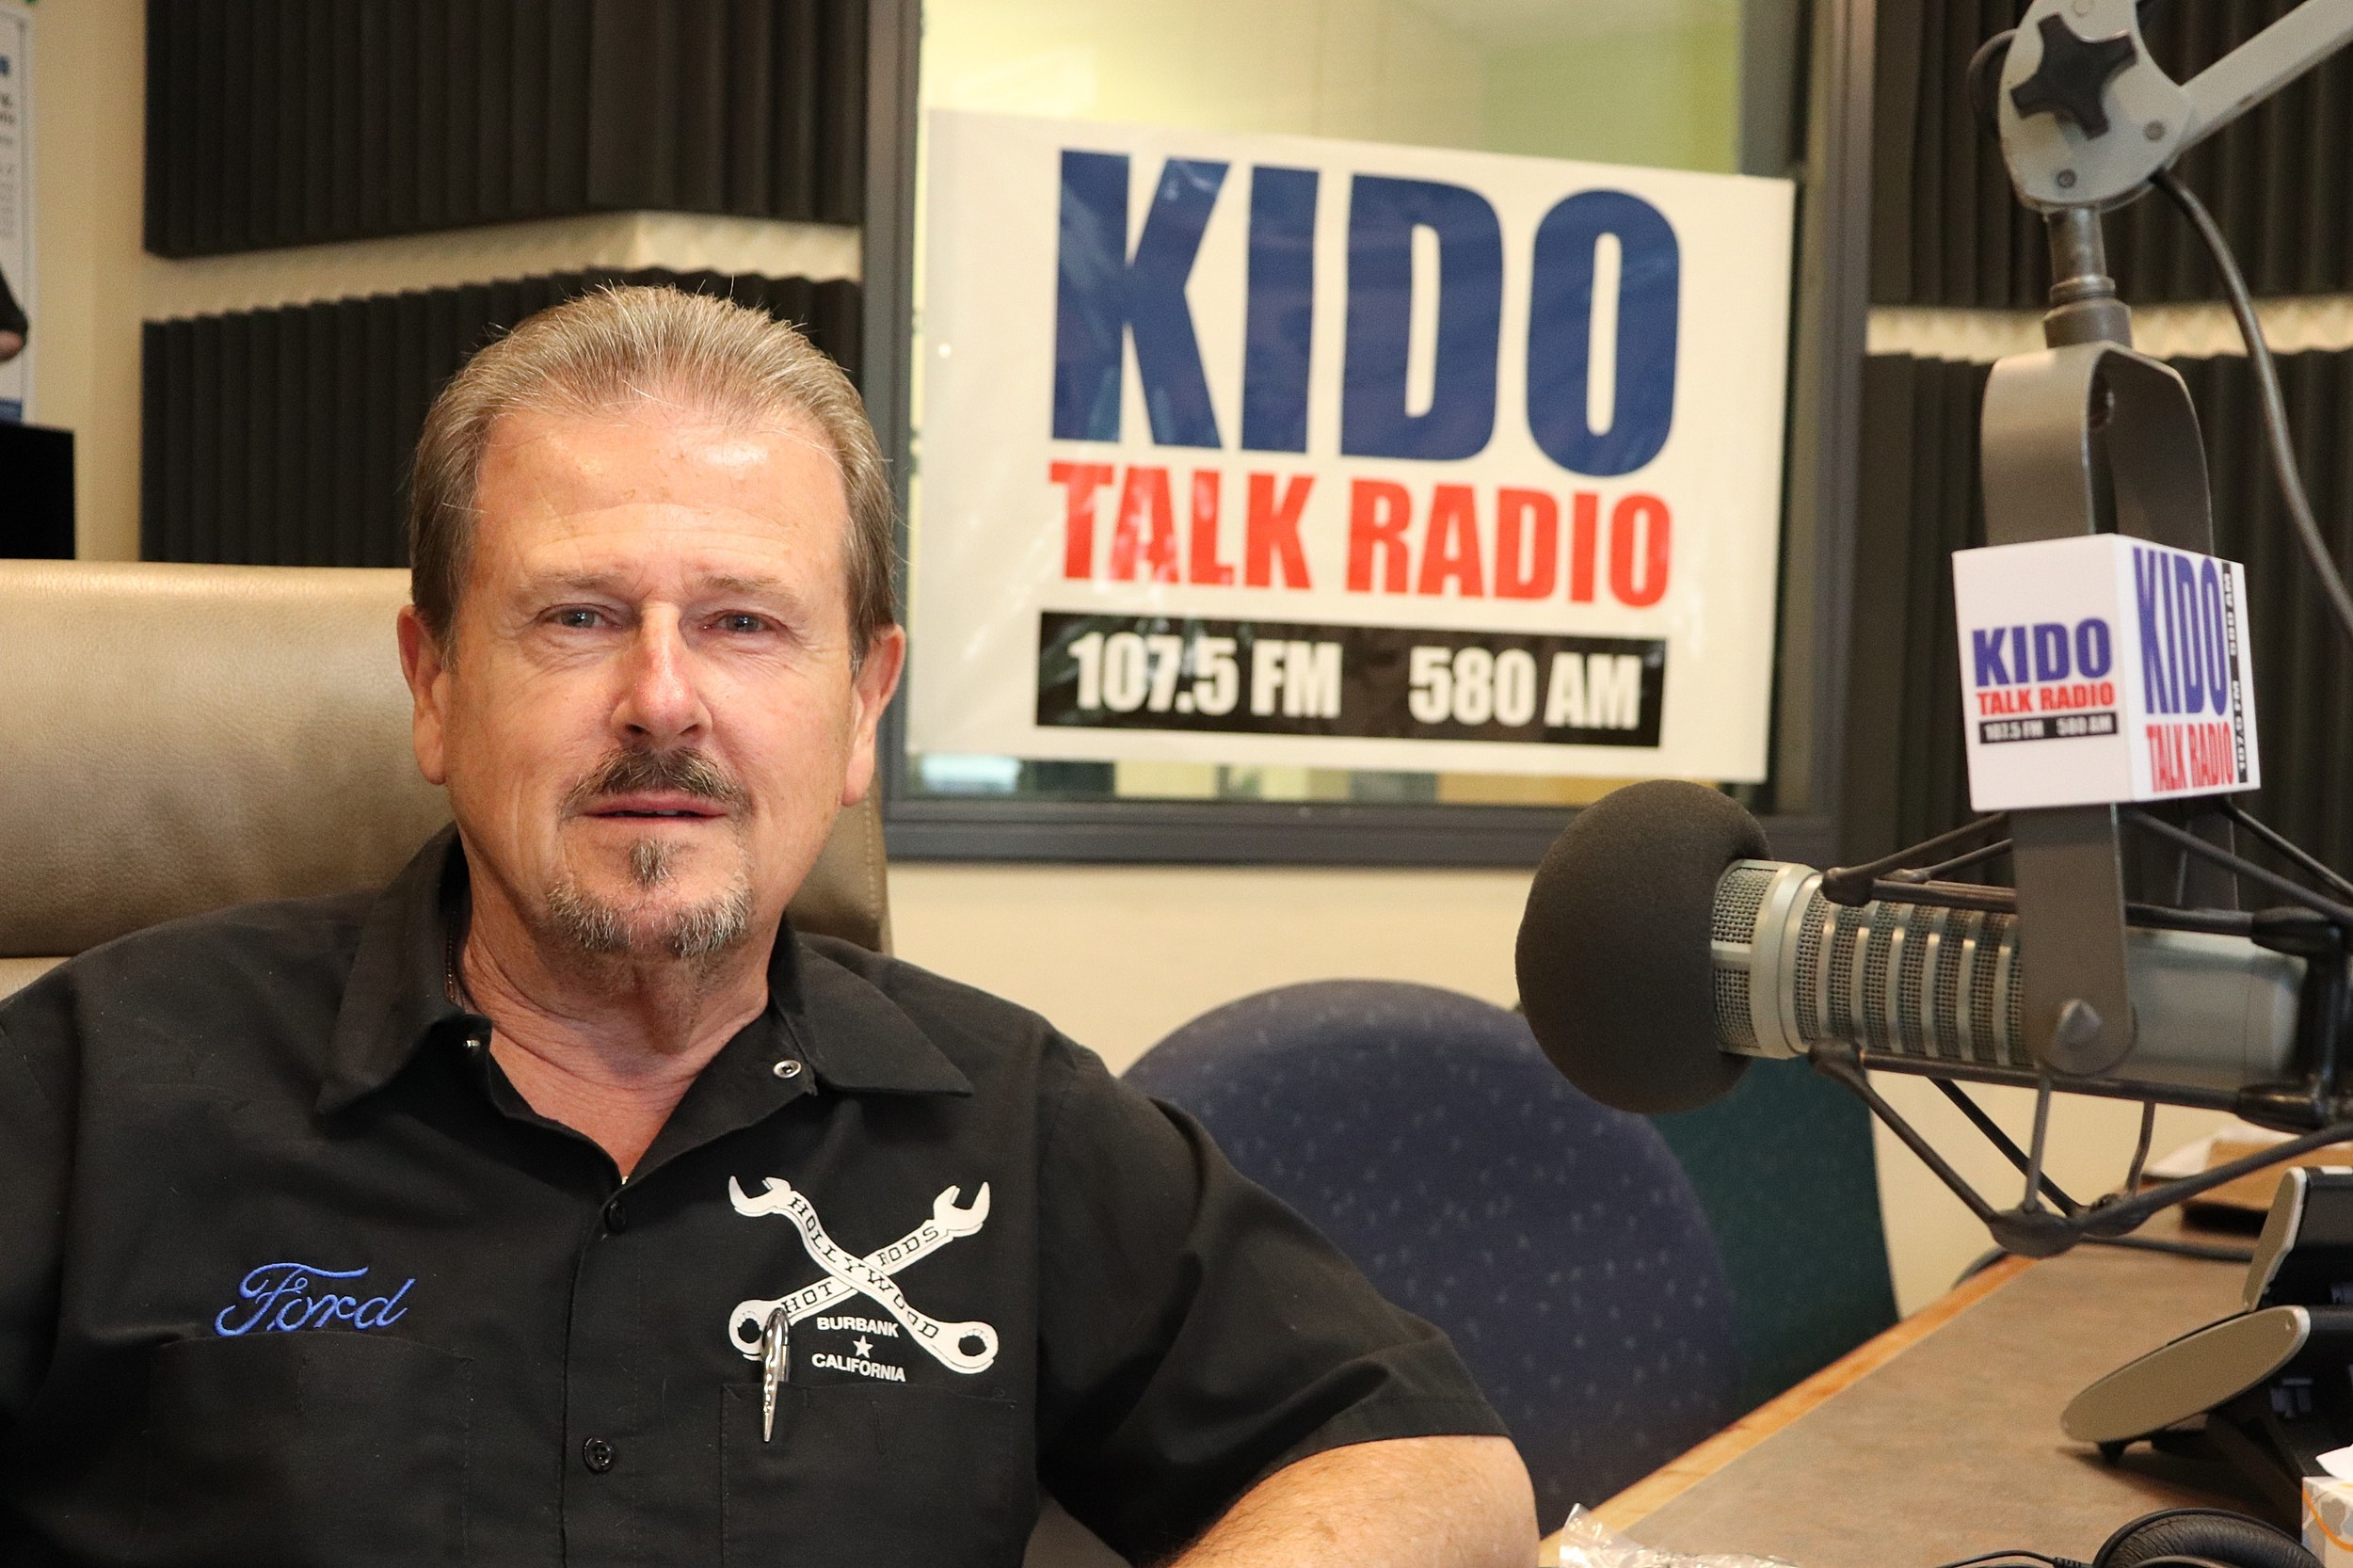 KIDO Talk Radio – 107 5 FM & 580 AM – Boise News Radio